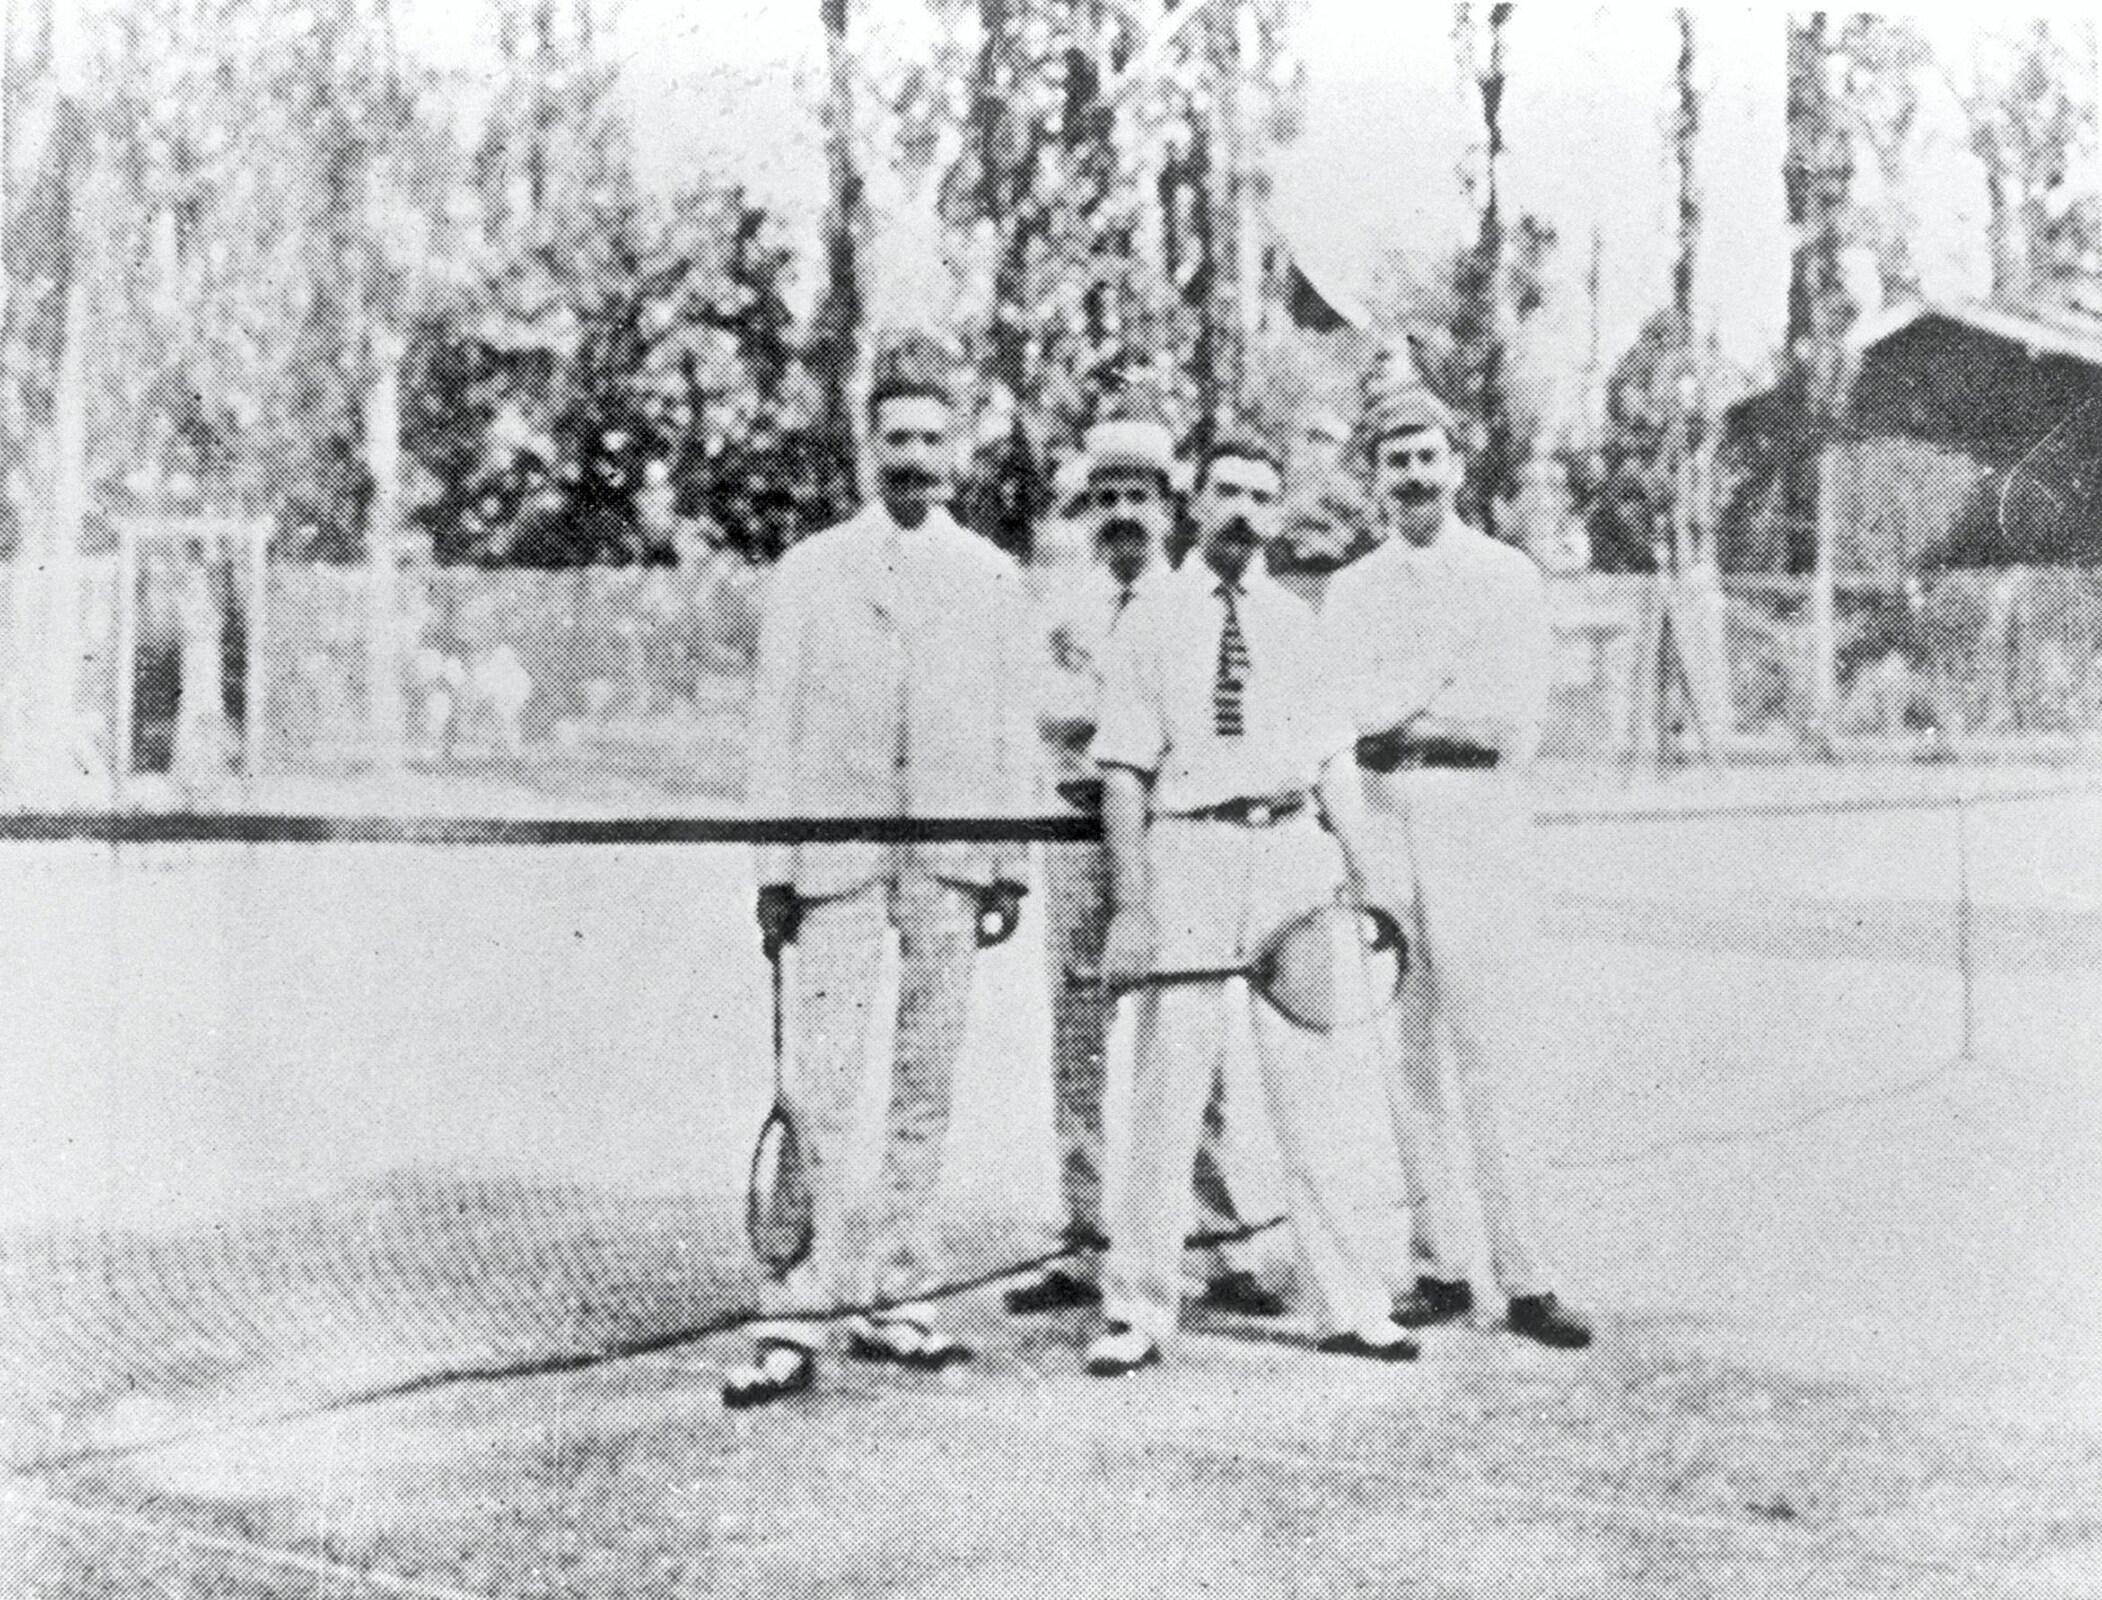 Baron Pierre de COUBERTIN on a tennis court.